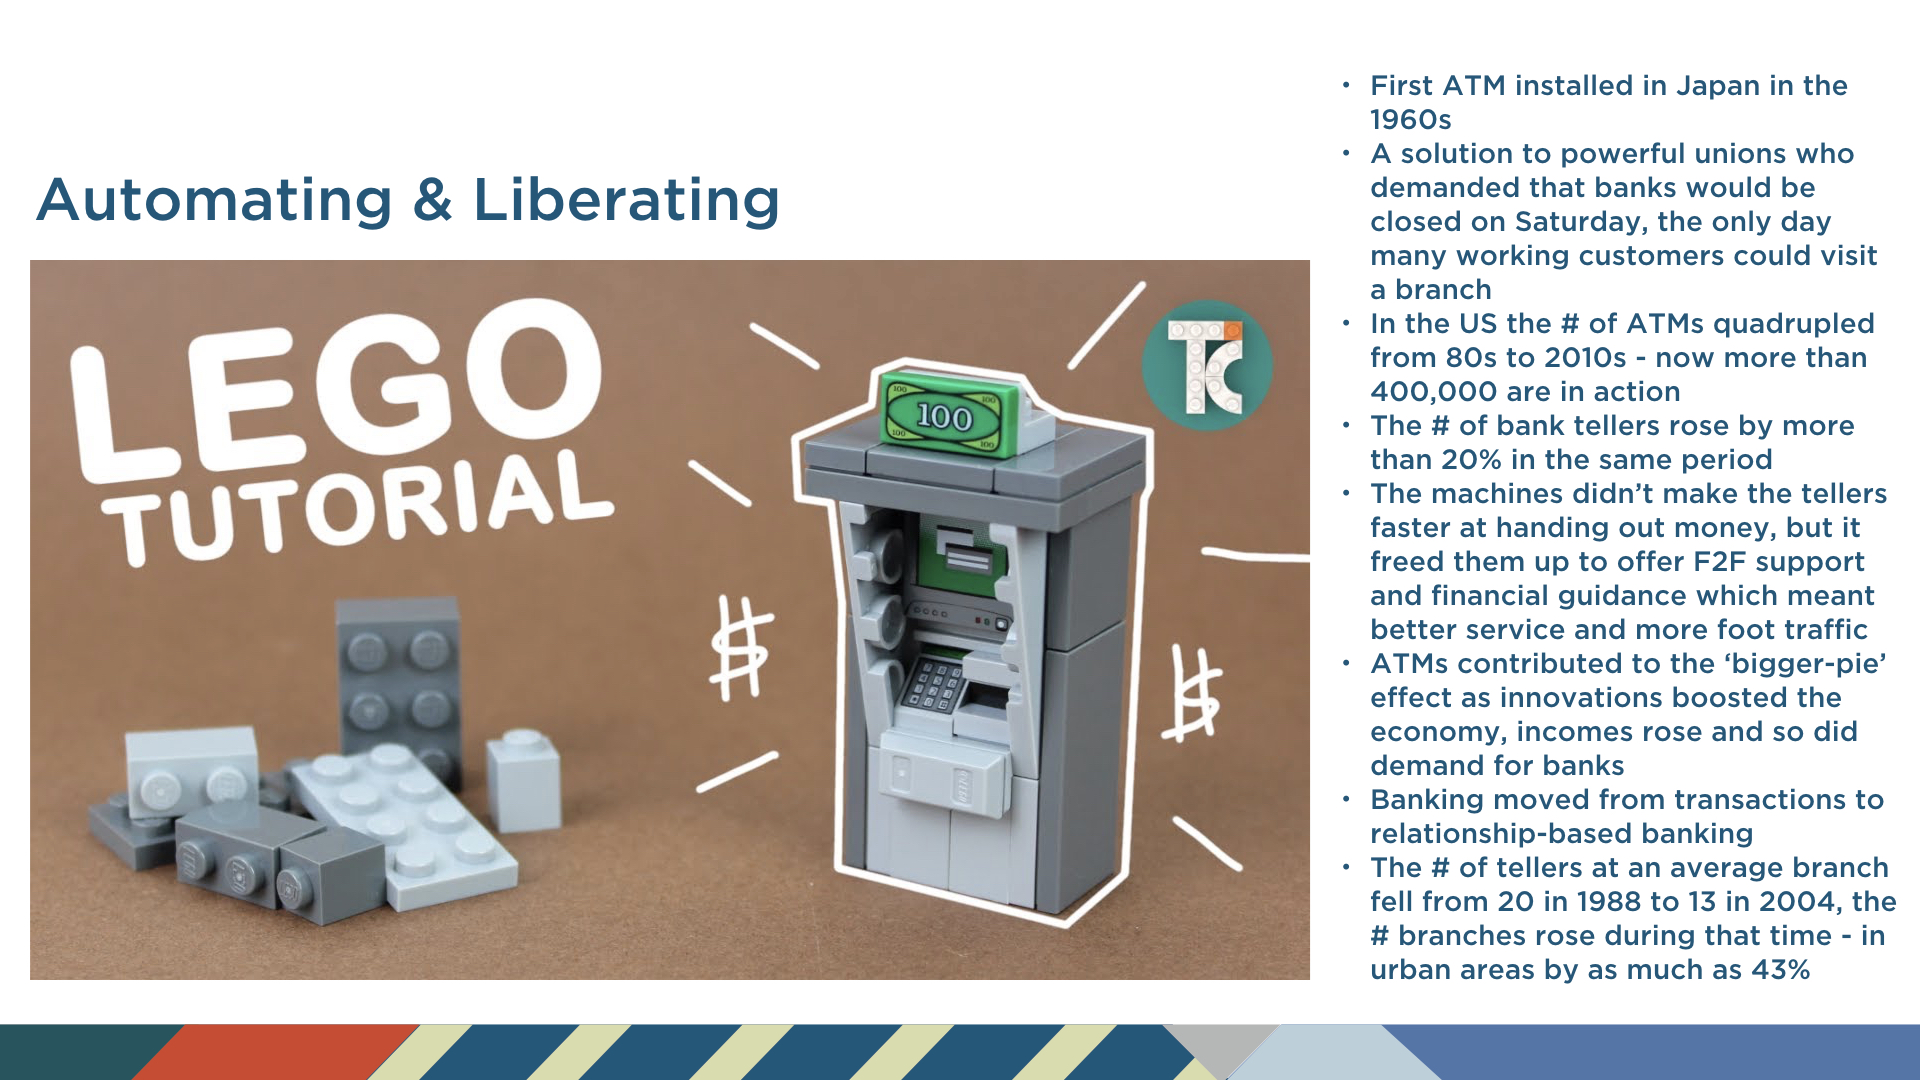 Automation ATMs Futurist Anders Sorman-Nilsson